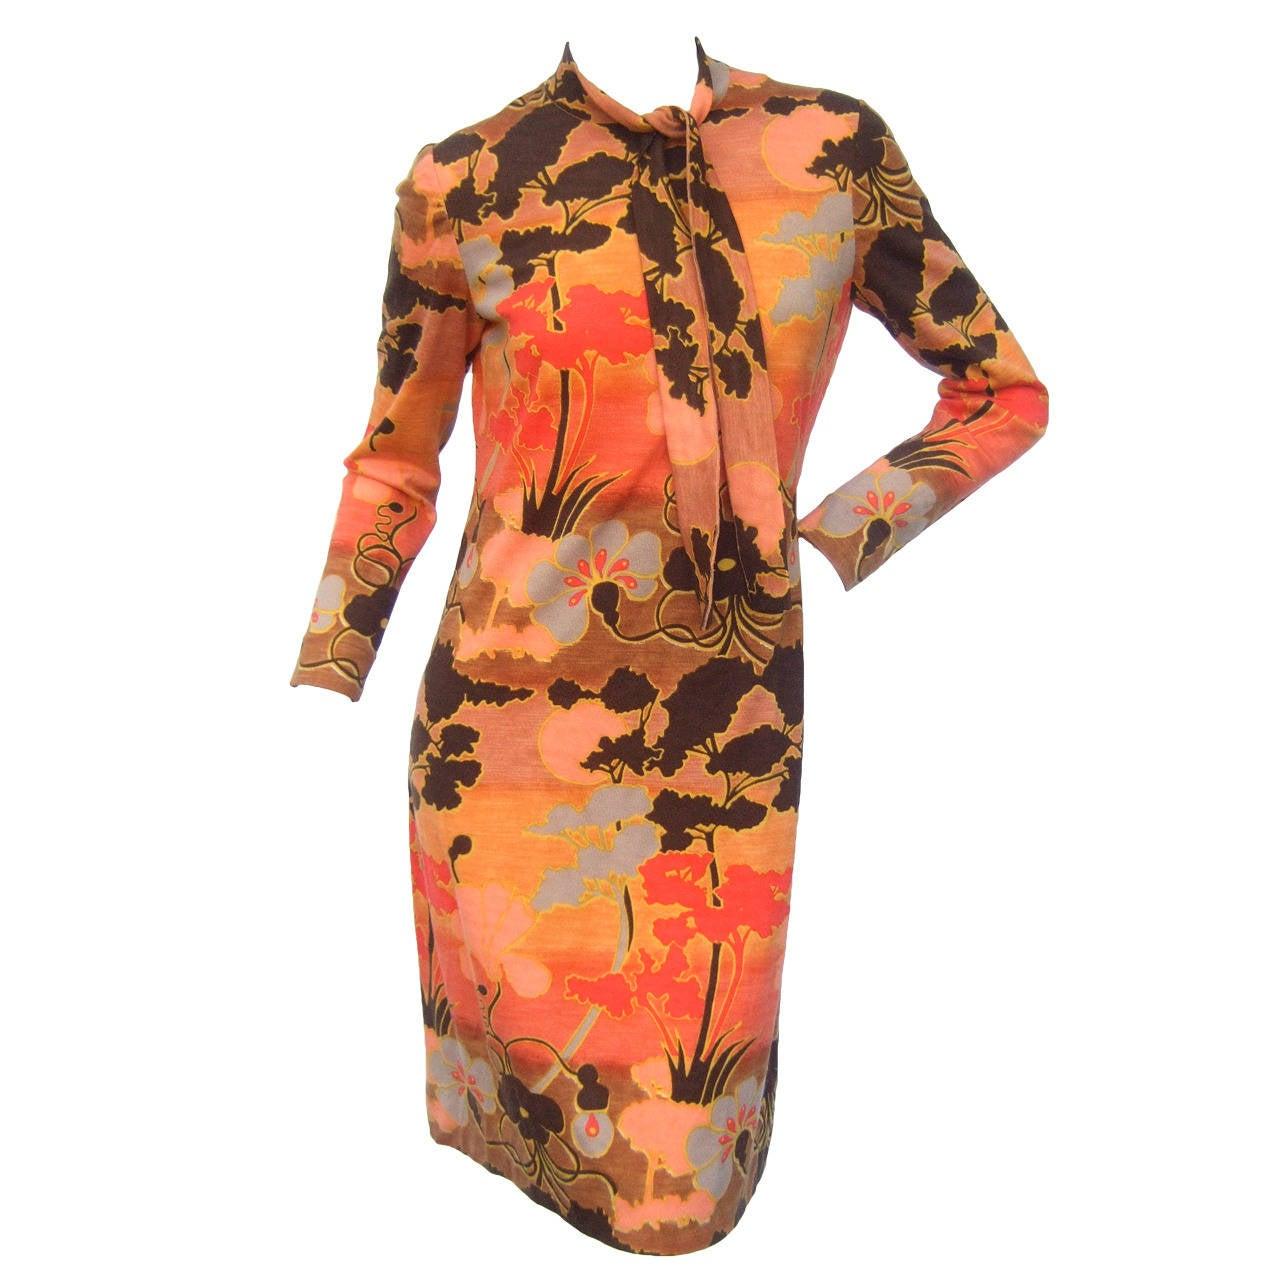 Italian Floral Print Merino Wool Knit Dress c 1970s For Sale